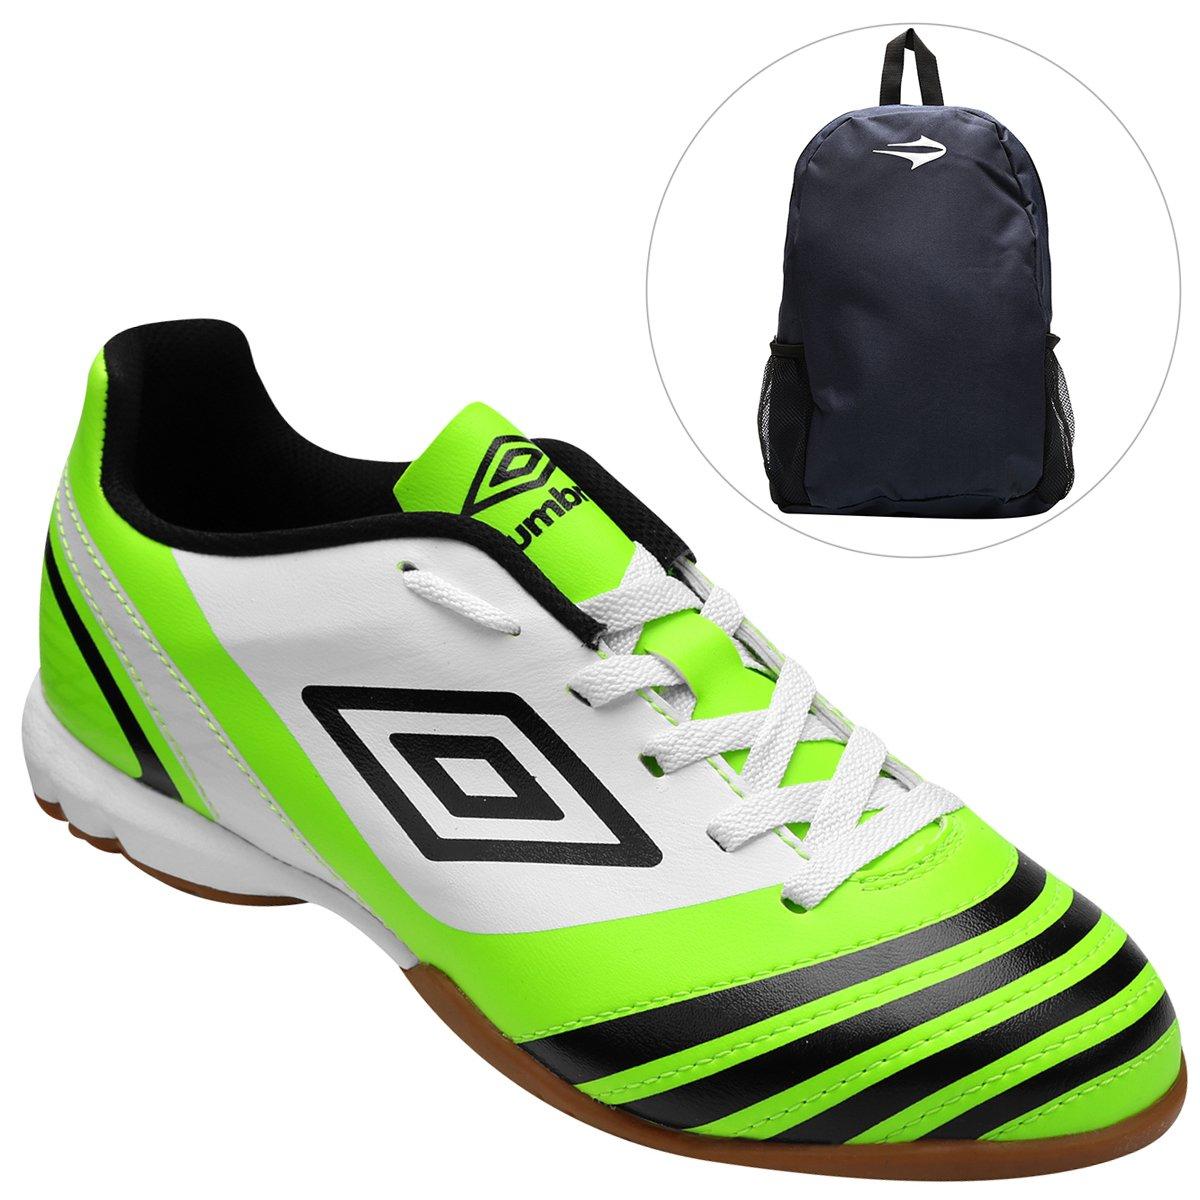 25a29e4cd3 Kit Chuteira Umbro Hunter Futsal + Mochila Topper Extreme - Compre Agora